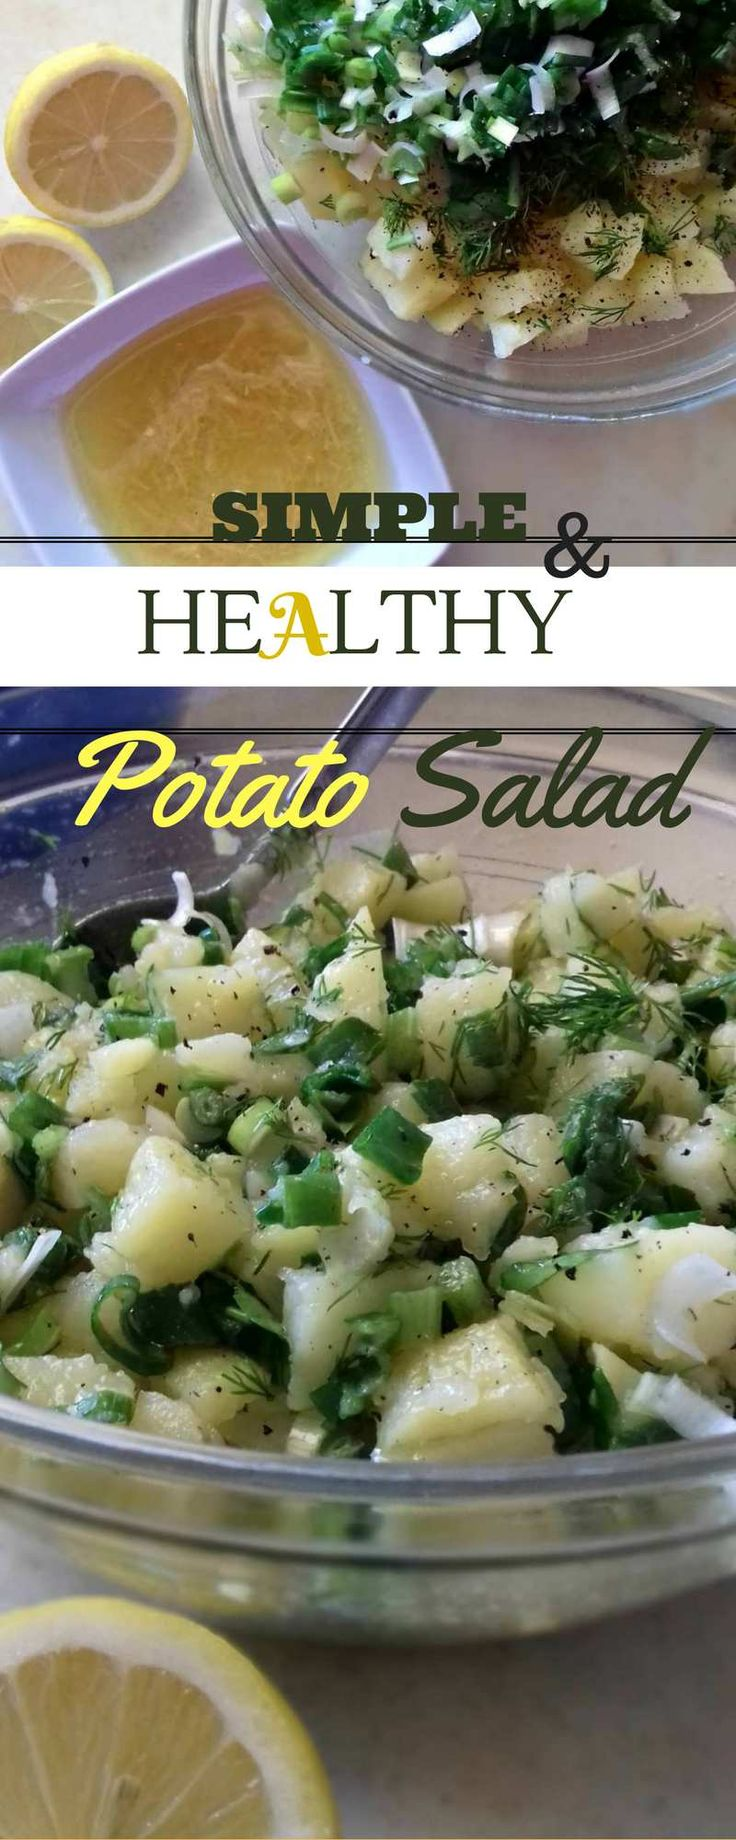 The Lightest Version Of A Potato Salad.  #springonion #dill #parsley #potatosalad #garlic #lemon #oliveoil #veryeasy #vegan